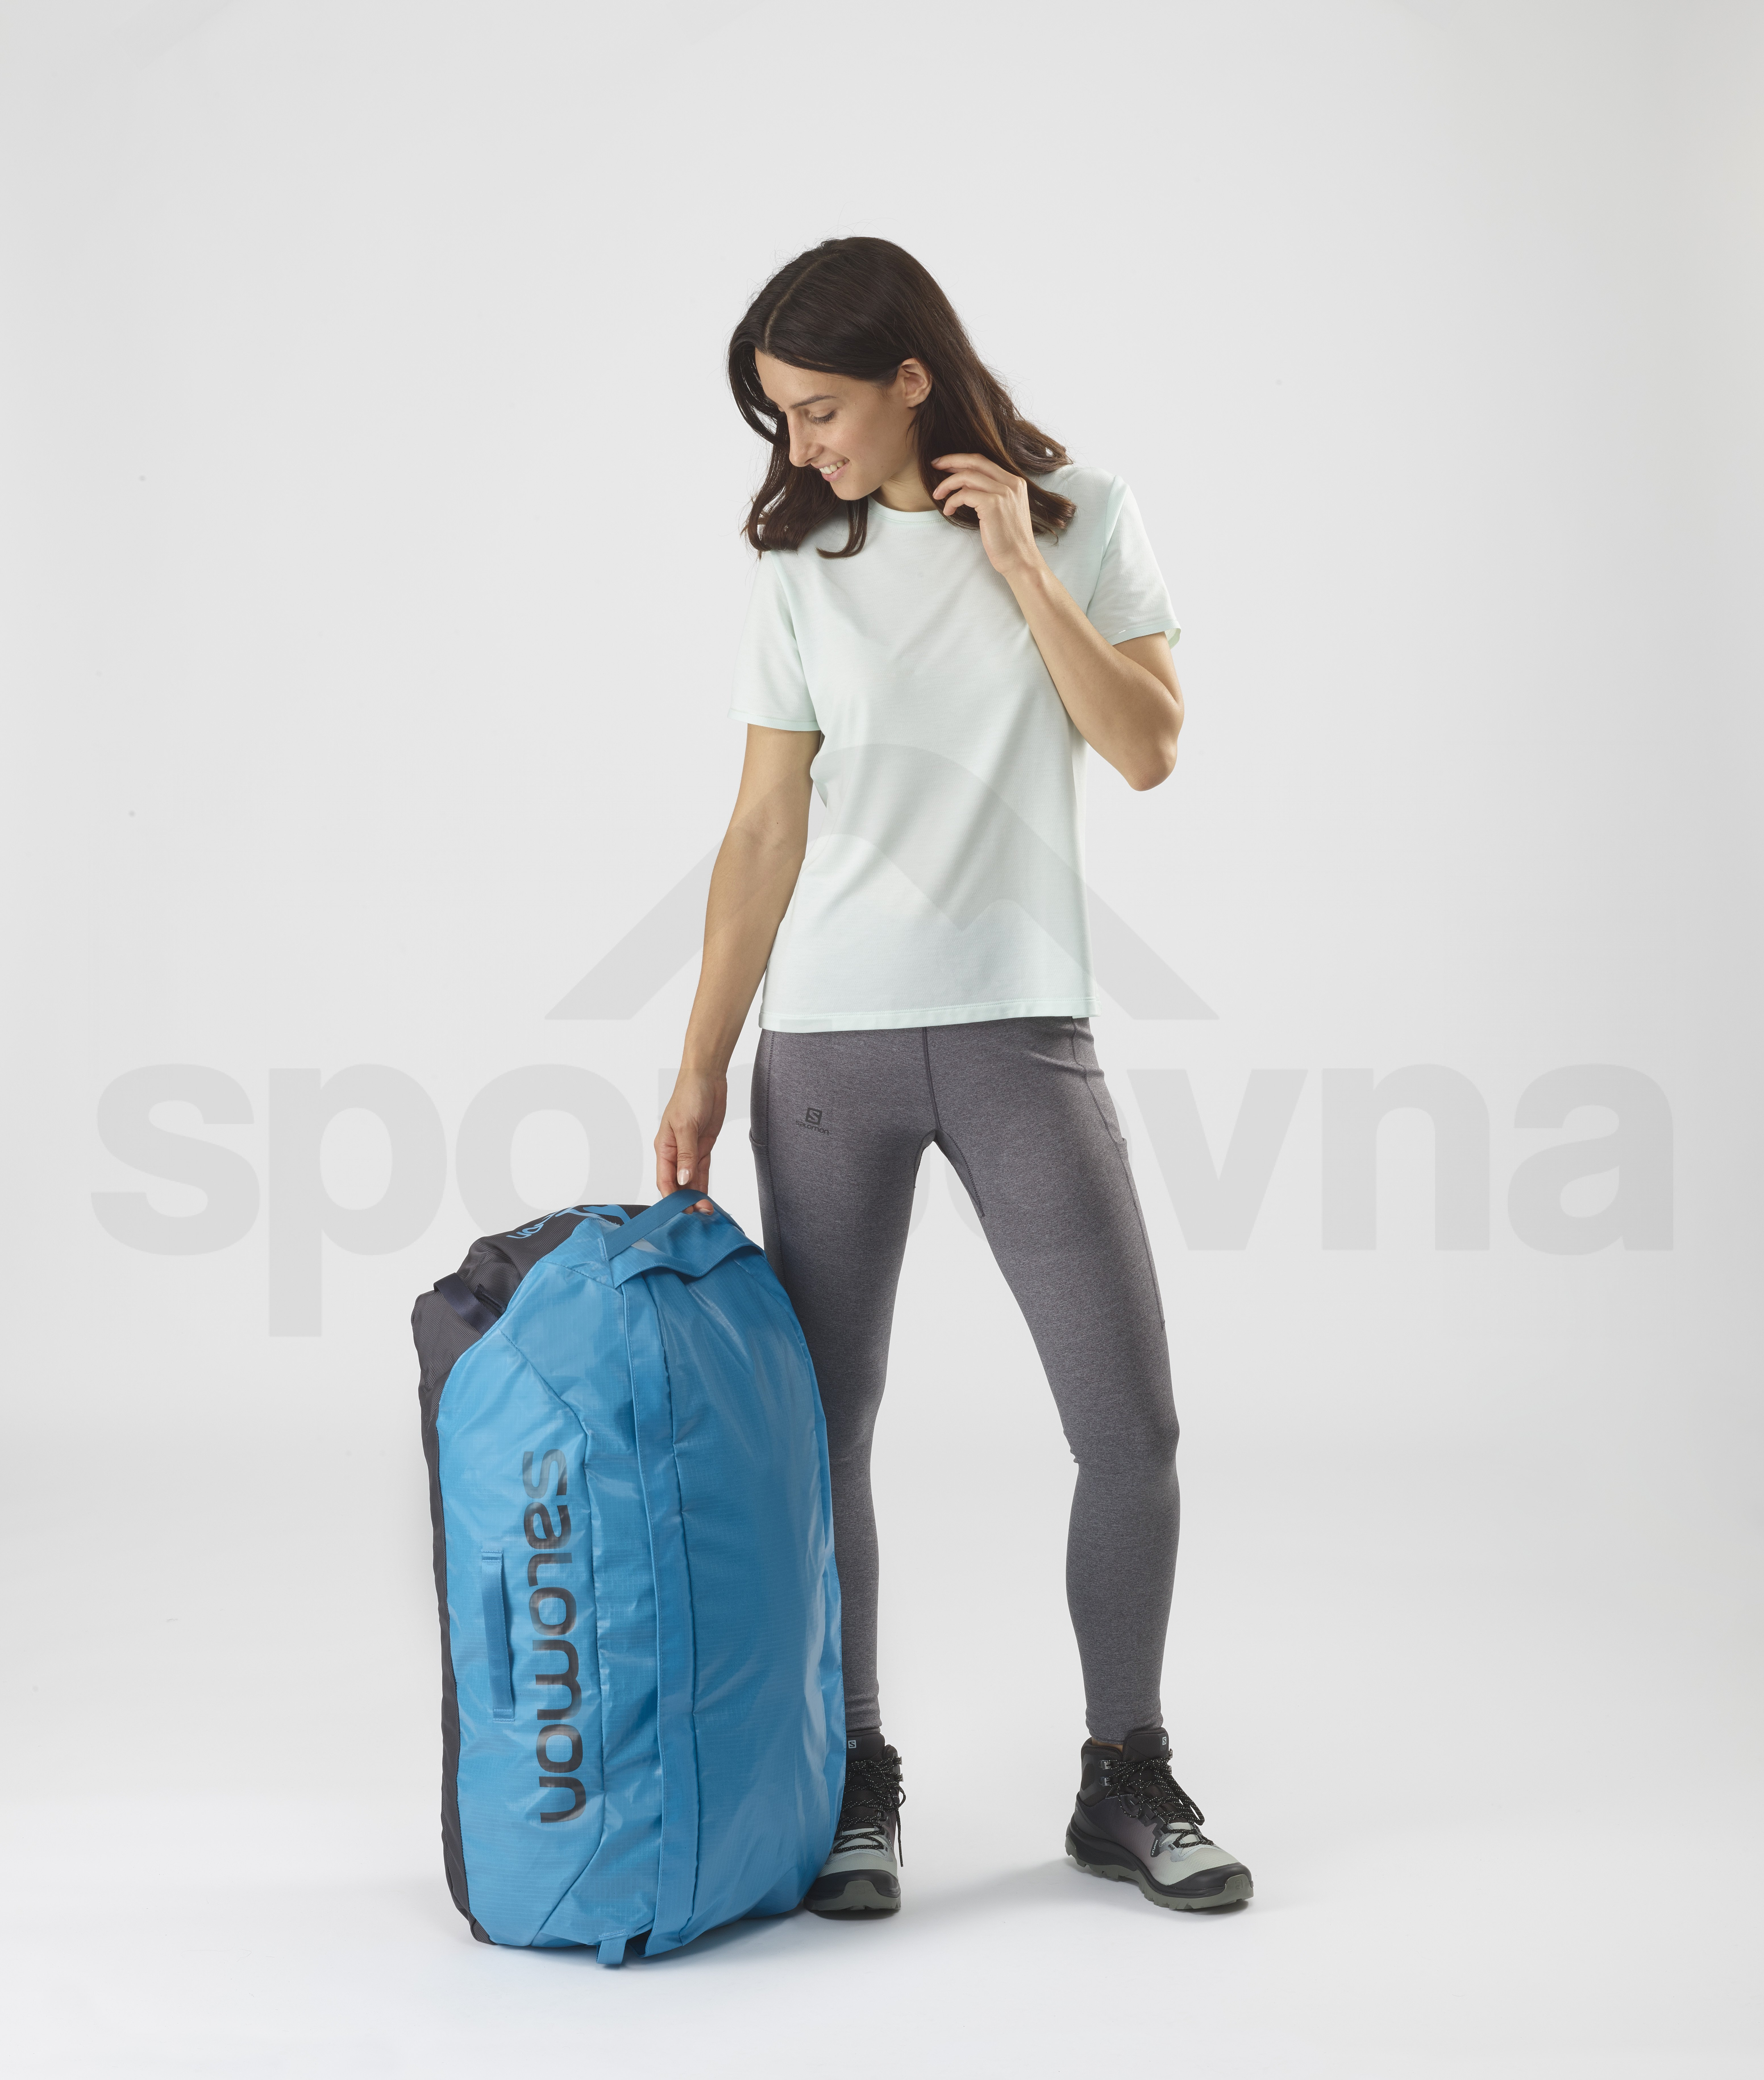 Cestovní taška Salomon OUTLIFE DUFFEL 70 - modrá